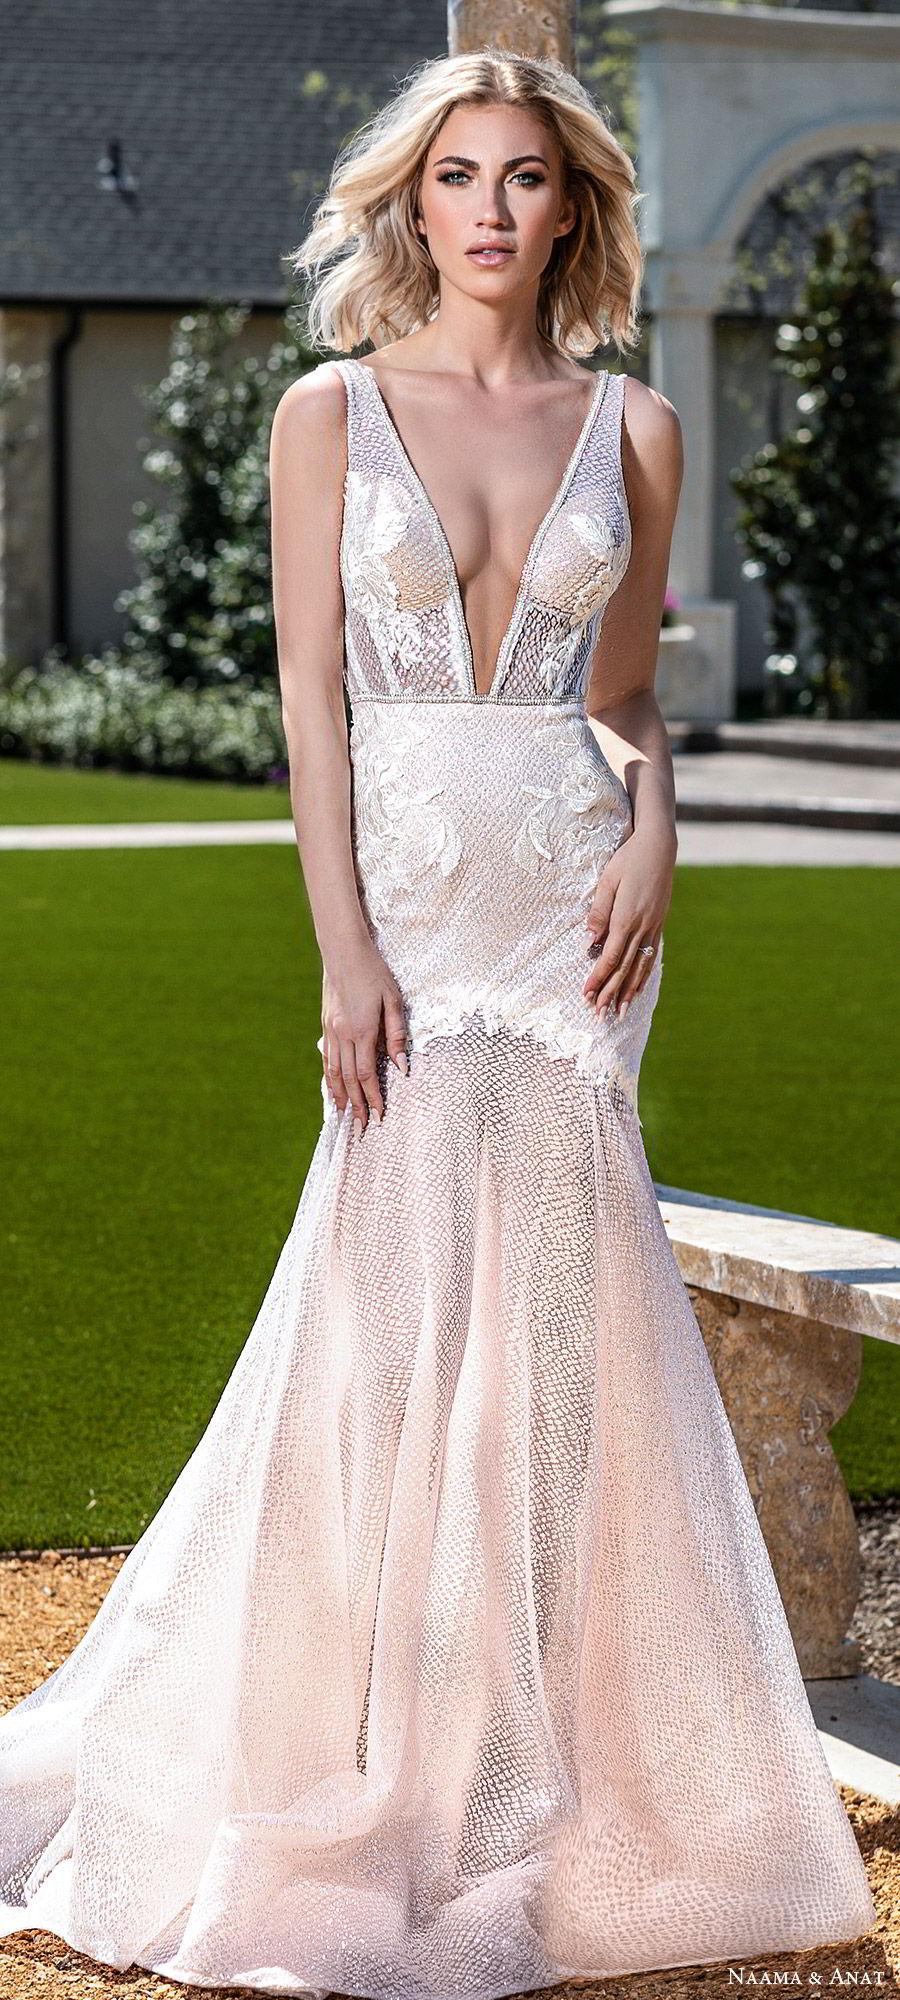 naama anat spring 2020 bridal sleeveless deep v neckline fit flare mermaid wedding dress (7) mv sheer low back chapel train sexy glamorours blush mv